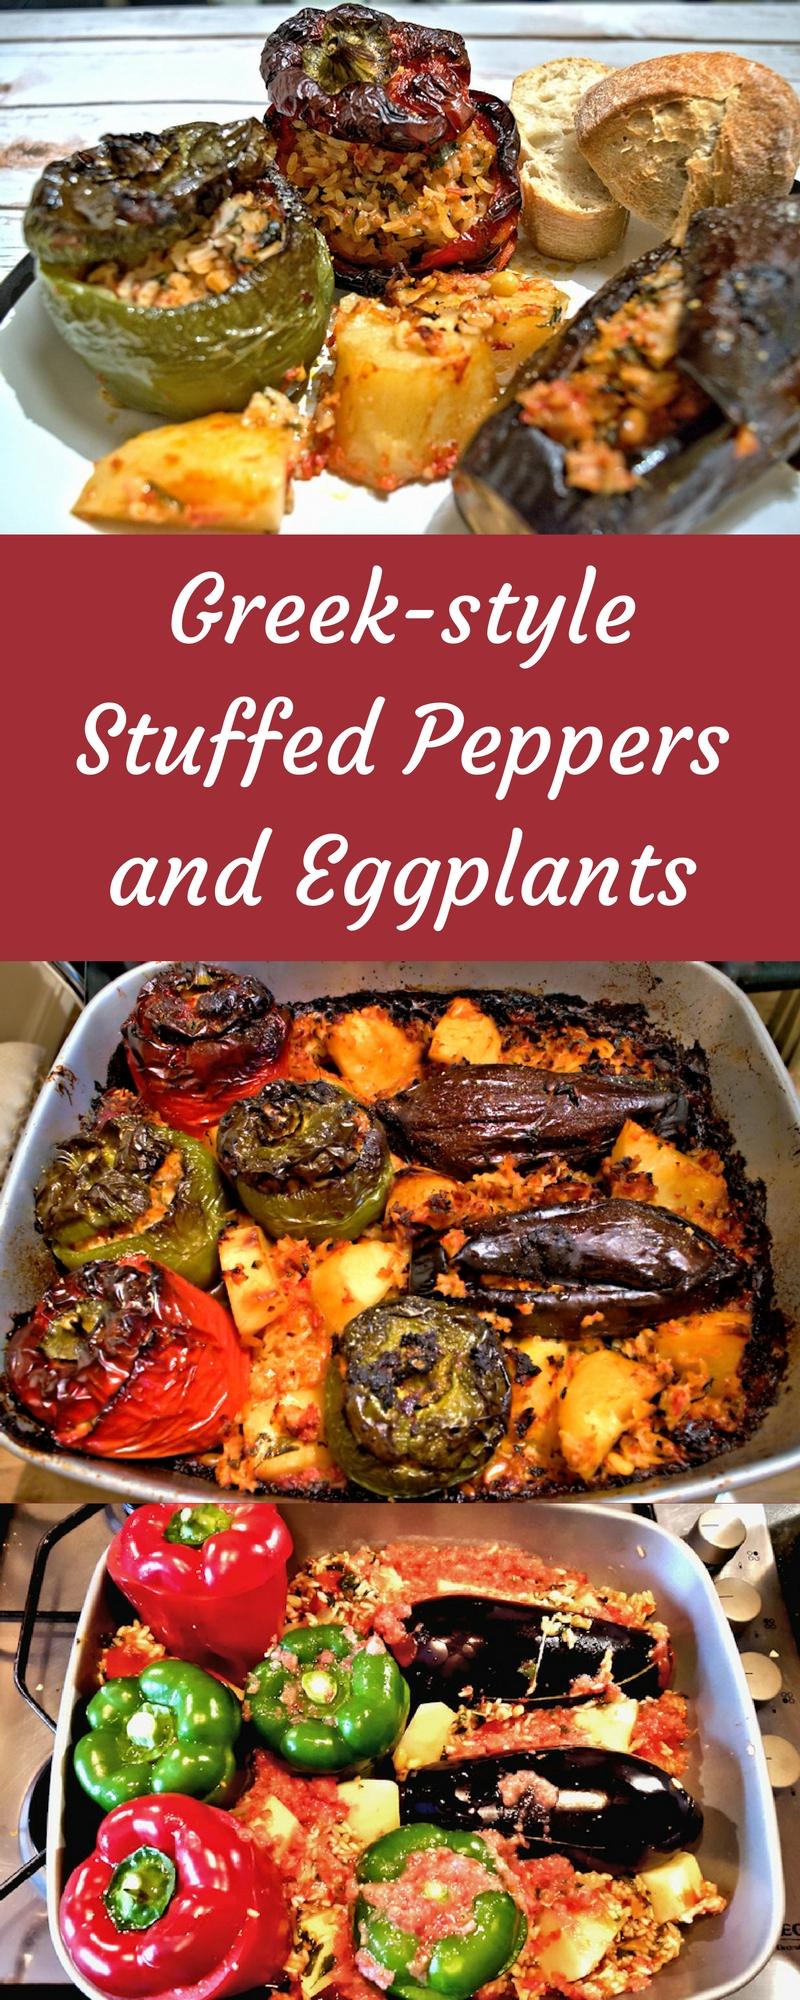 Greek Style Stuffed Peppers And Eggplants Gemista Socraticfood Recipe Stuffed Peppers Greek Recipes Greek Cooking